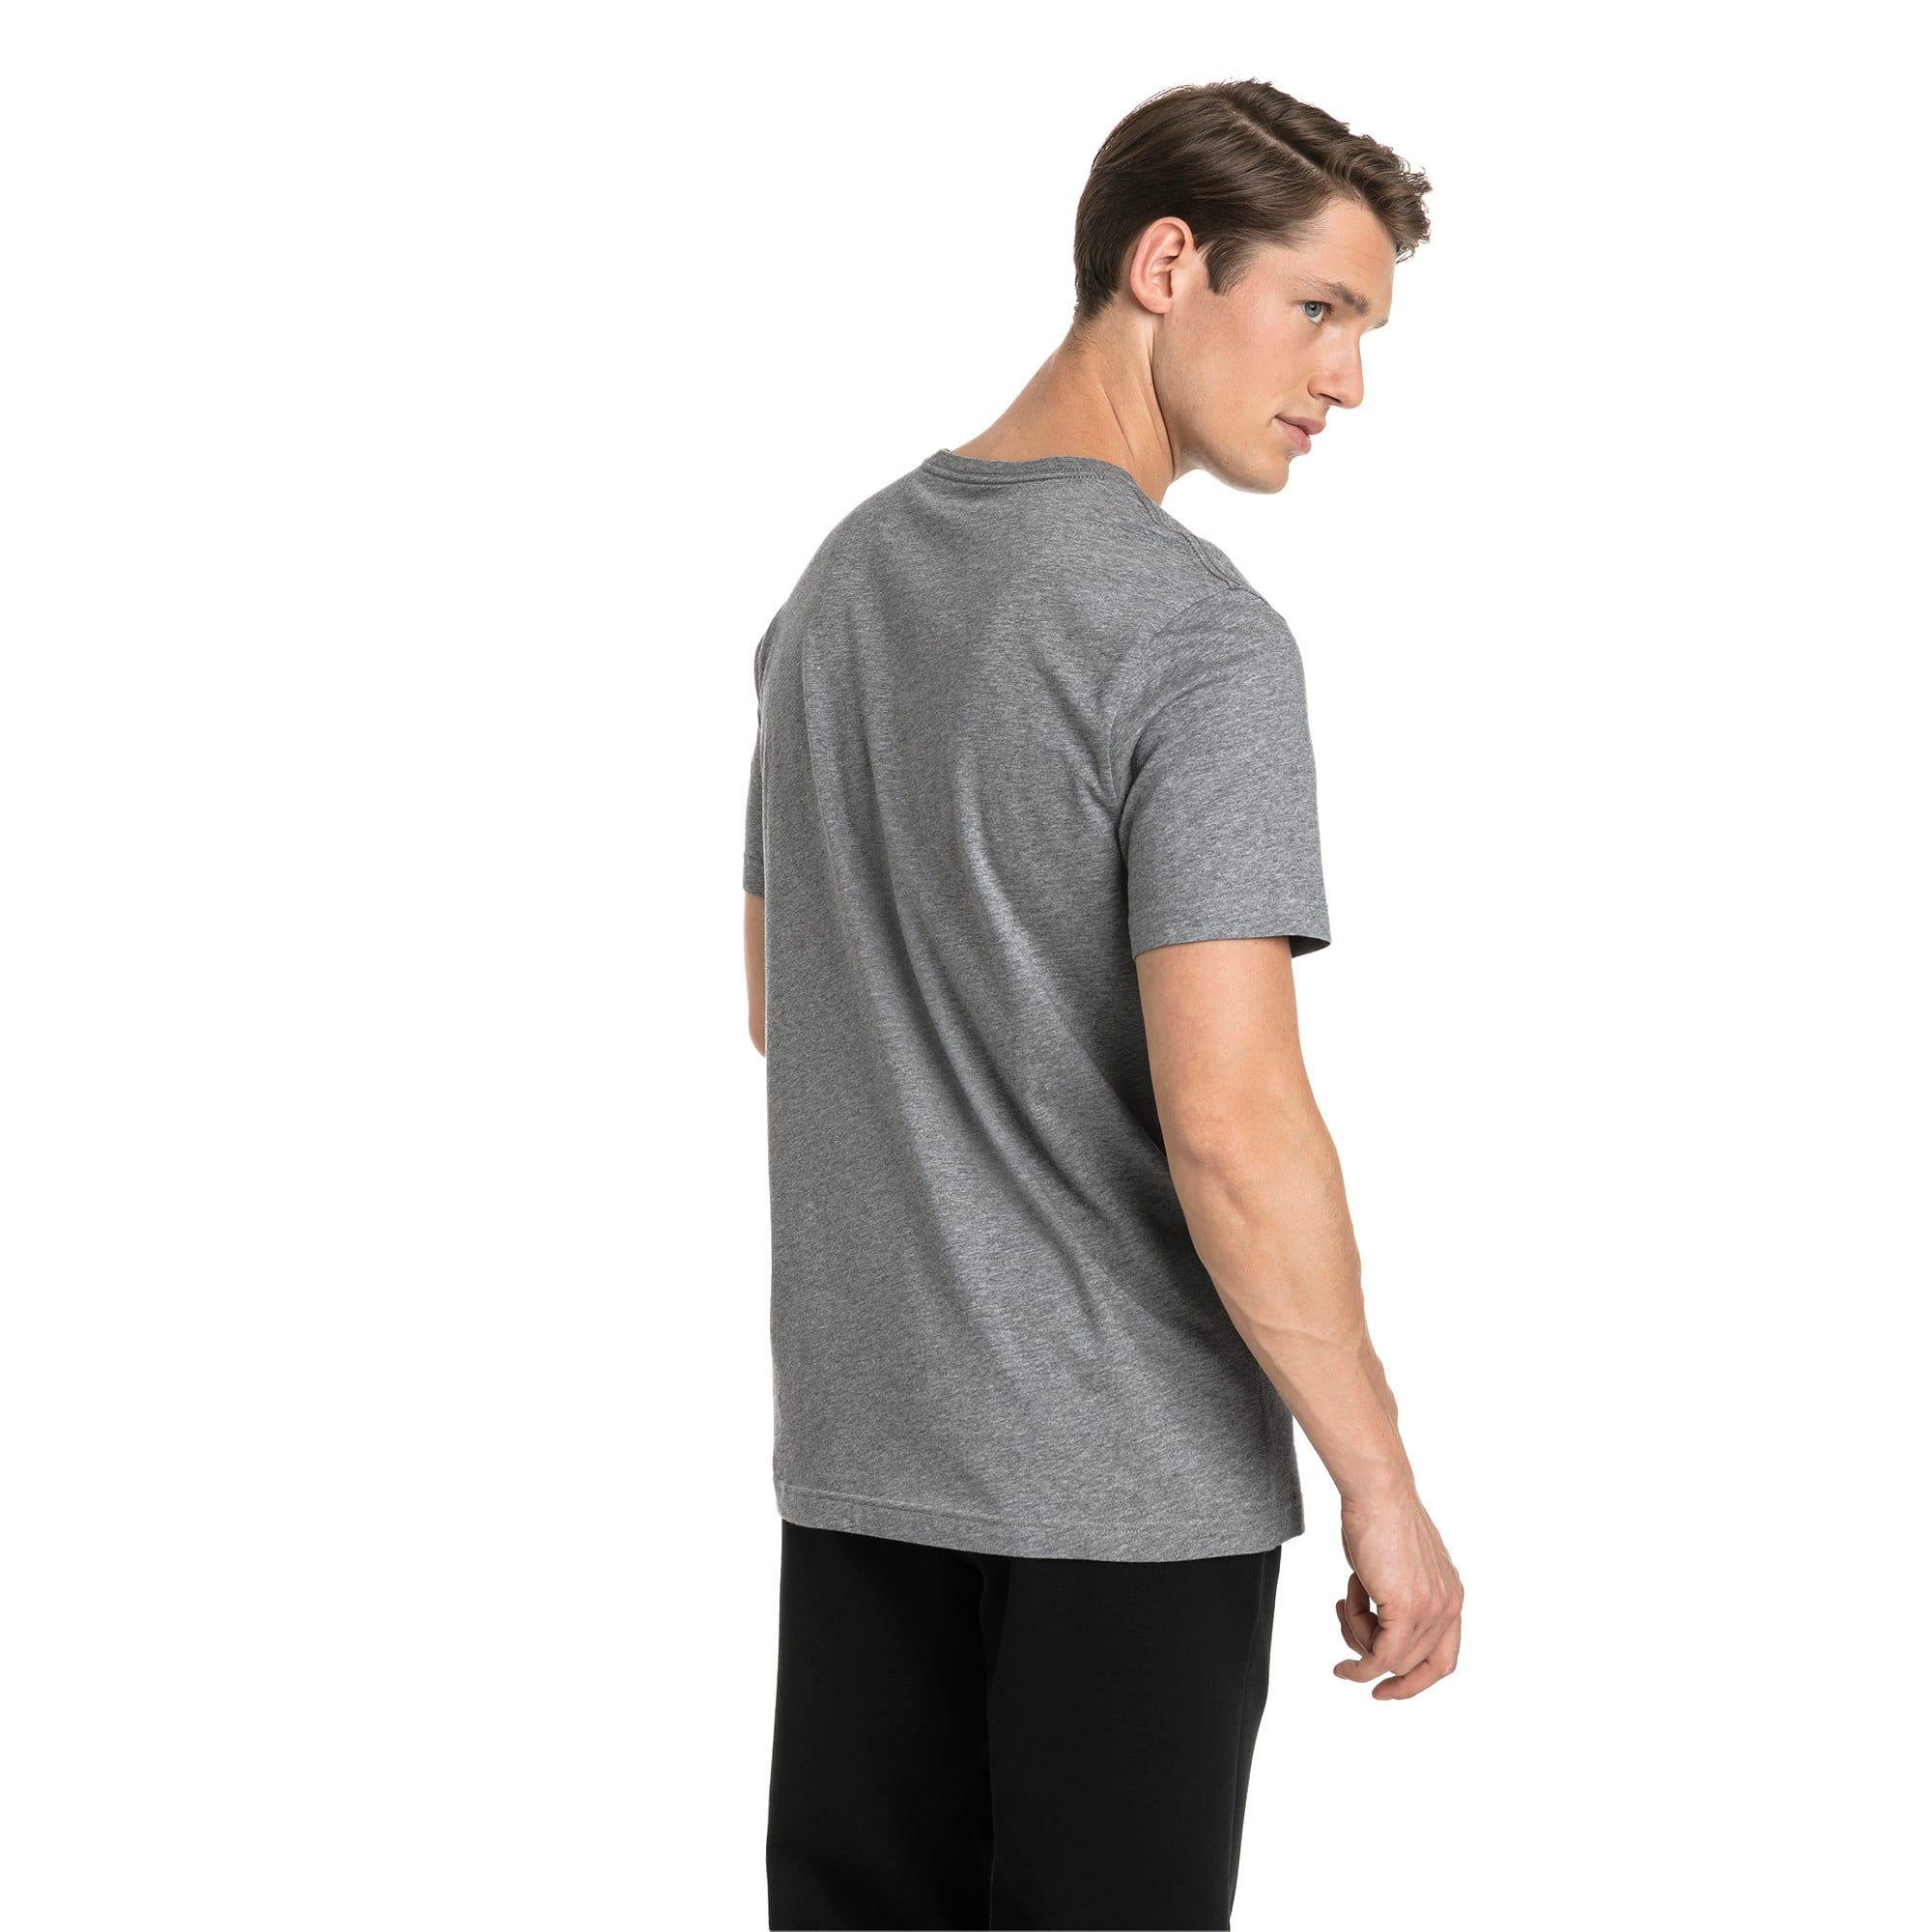 Thumbnail 2 of T-shirt con logo piccolo Essentials uomo, Medium Gray Heather-_Cat, medium